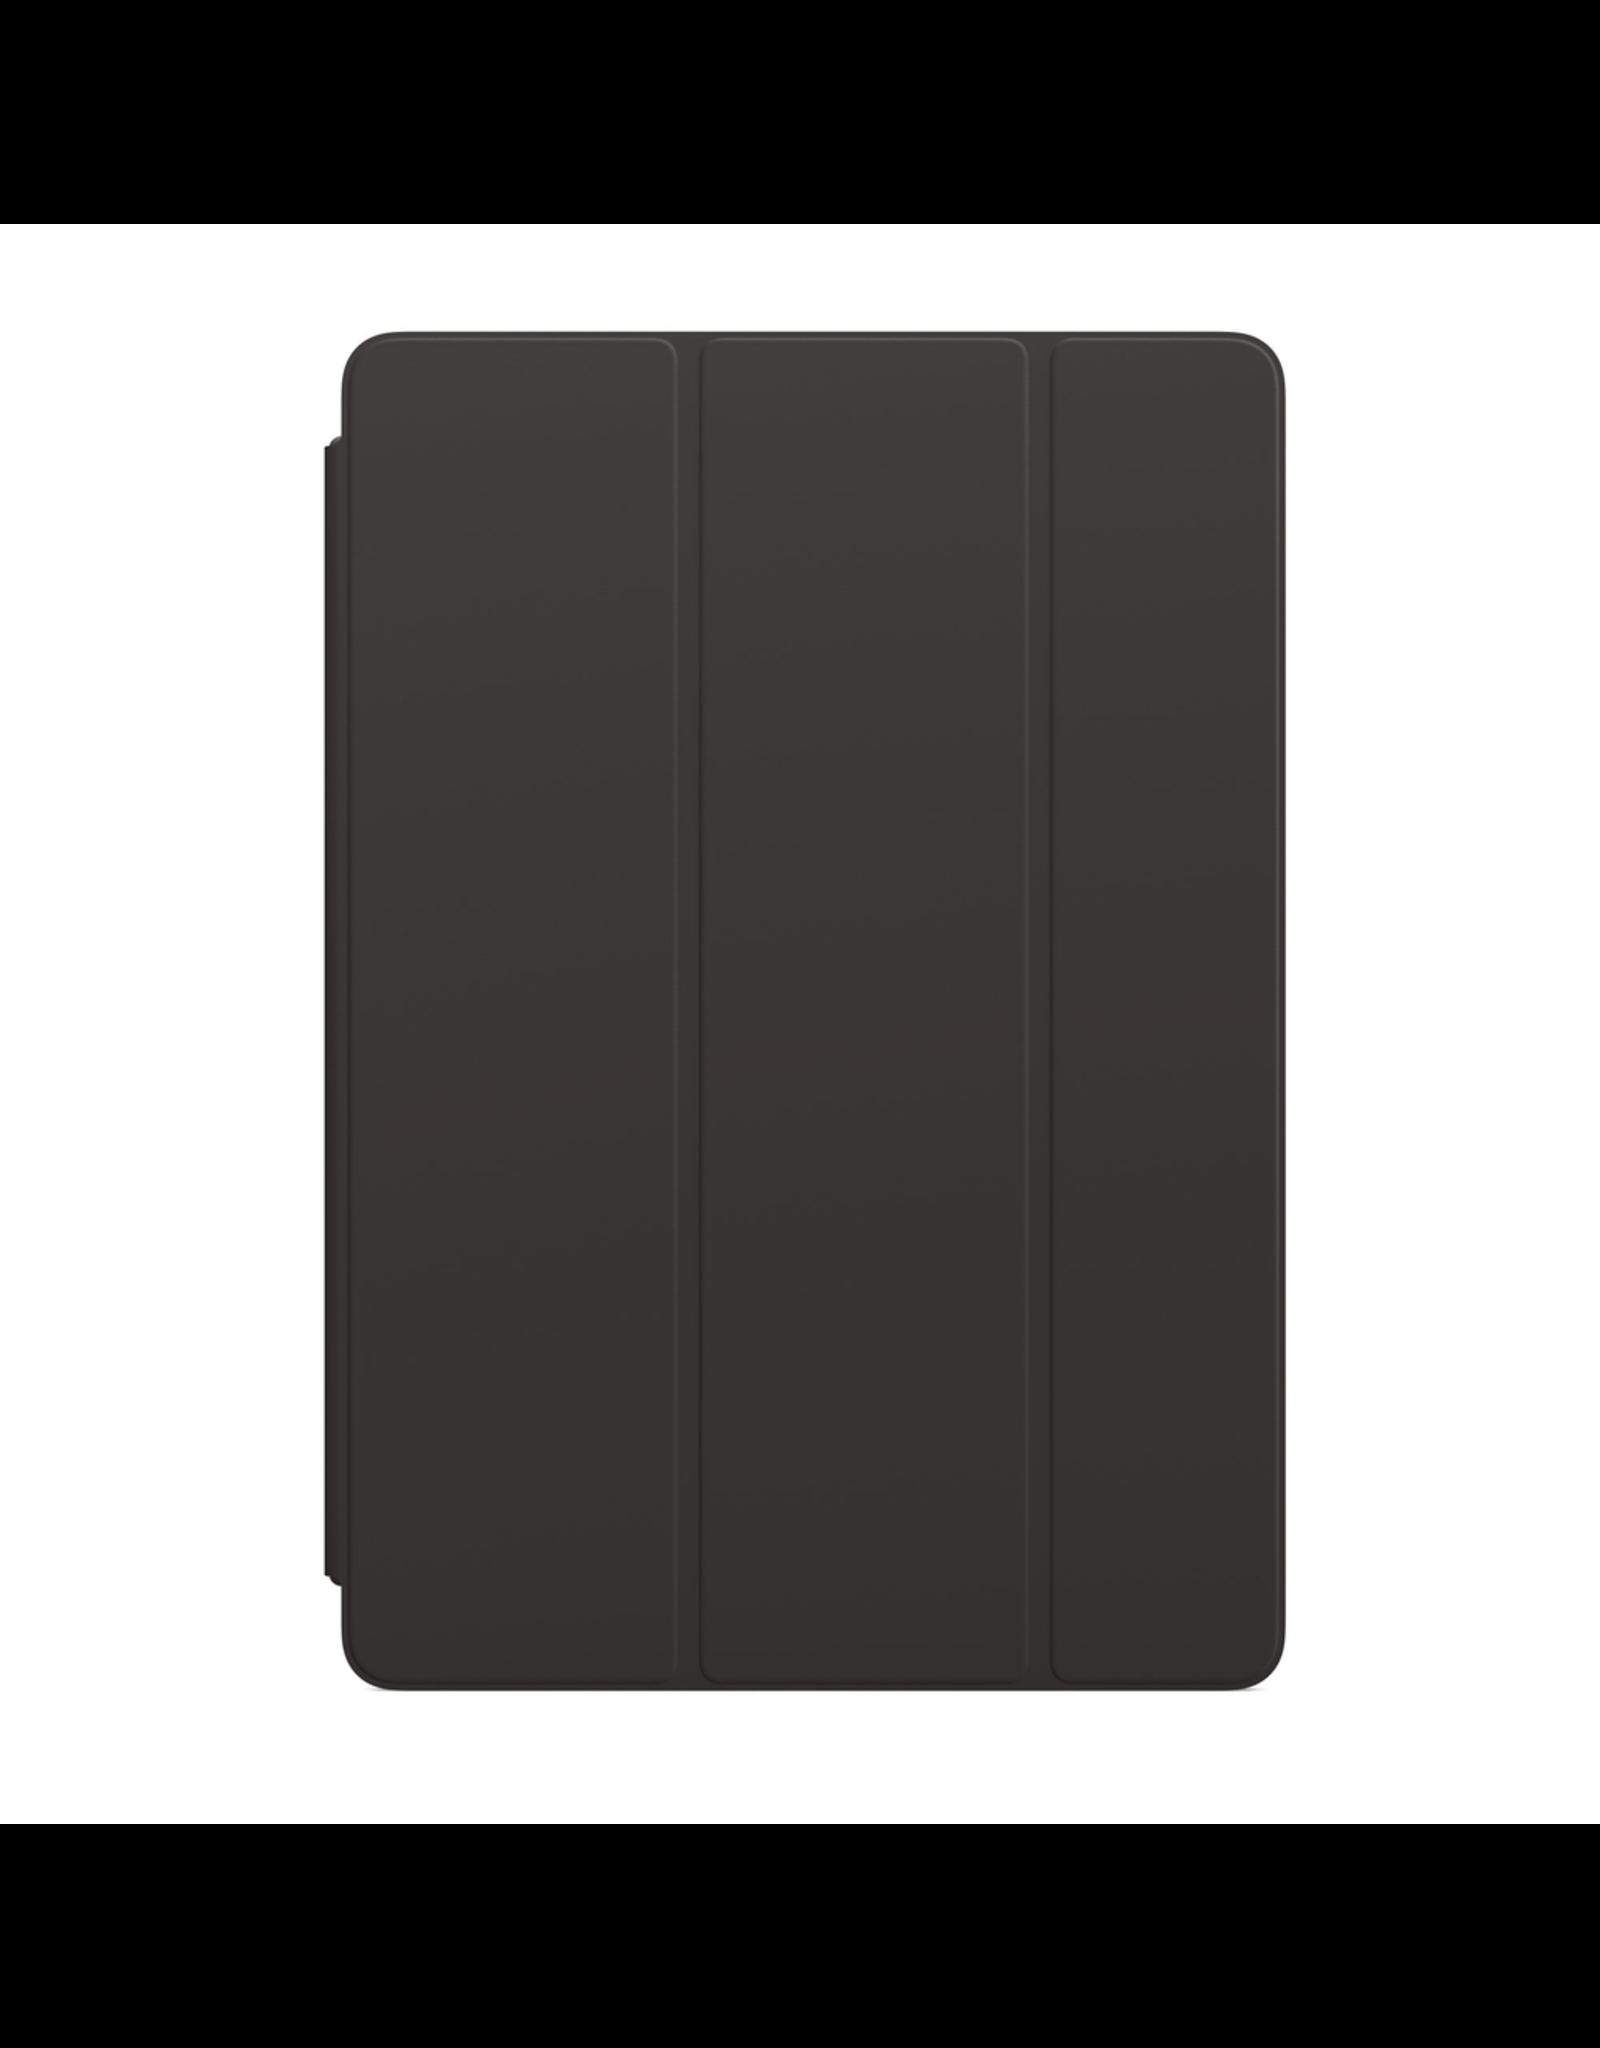 Apple Apple Smart Cover for iPad - Black - (7th/8th/9th Gen), iPad Air (3rd generation) & iPad Pro 10.5-inch